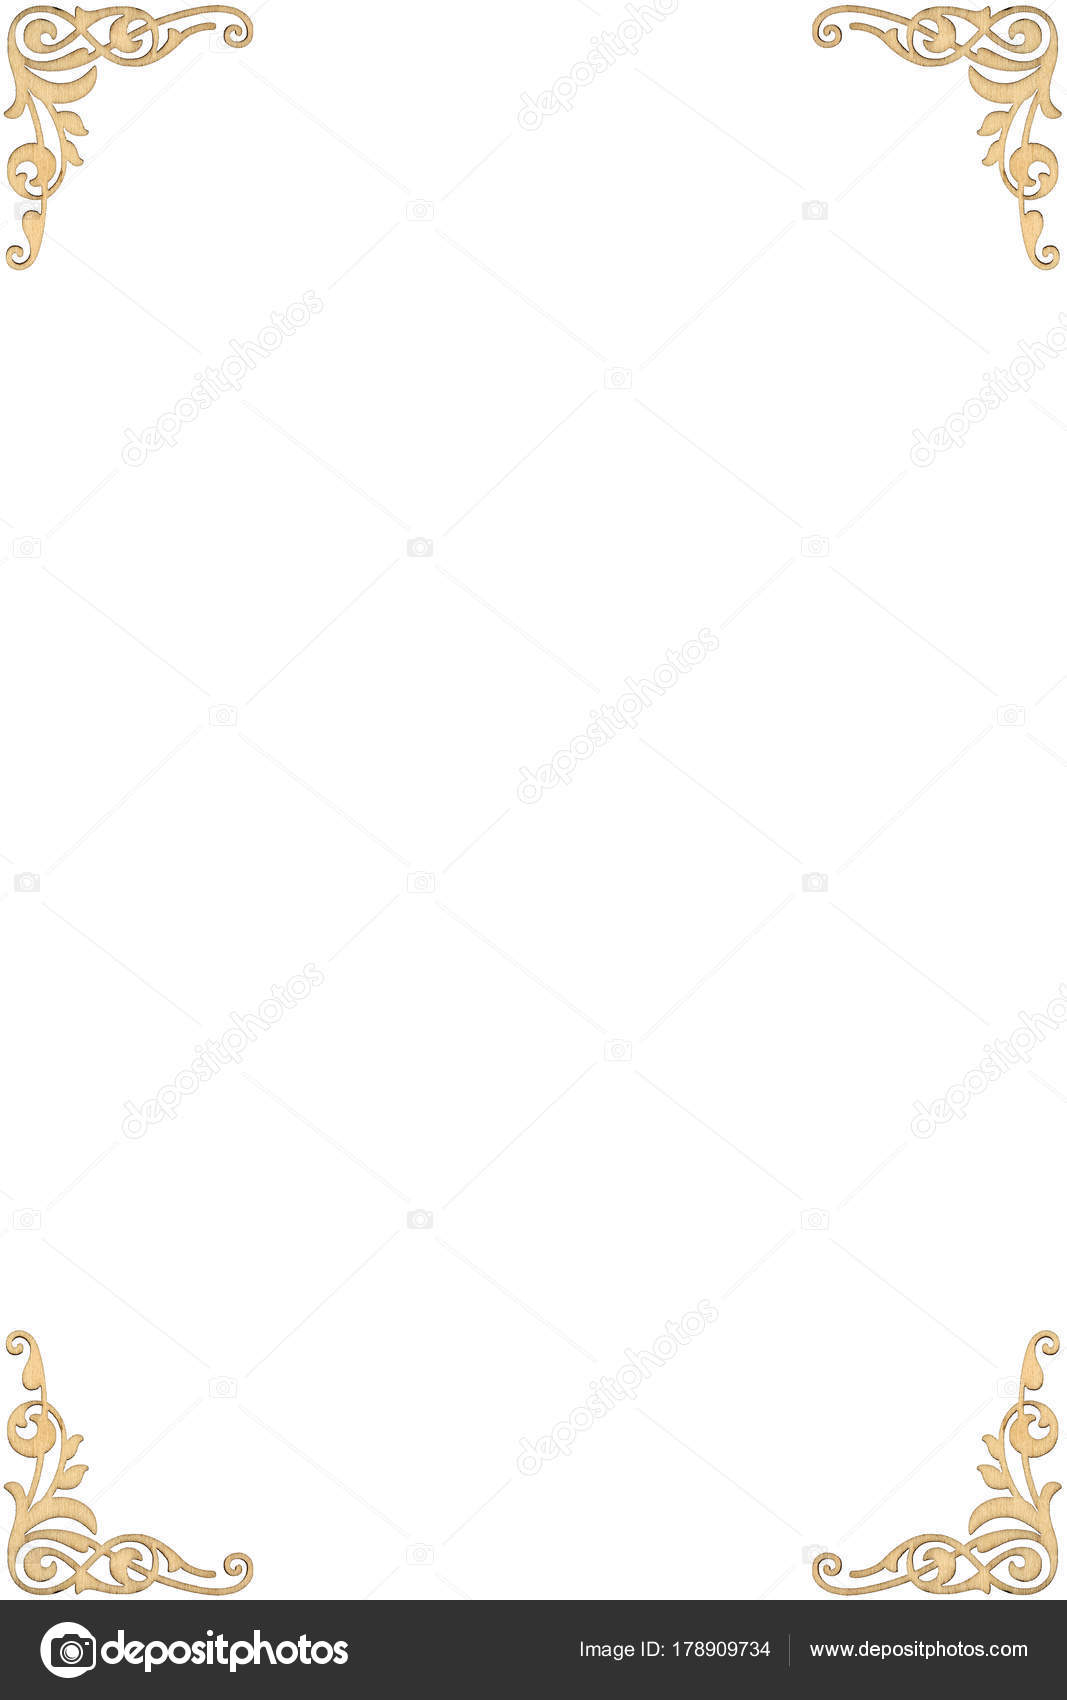 Rahmen Mit Retro Ornament Muster Im Barock Stil Dekor Stockfoto